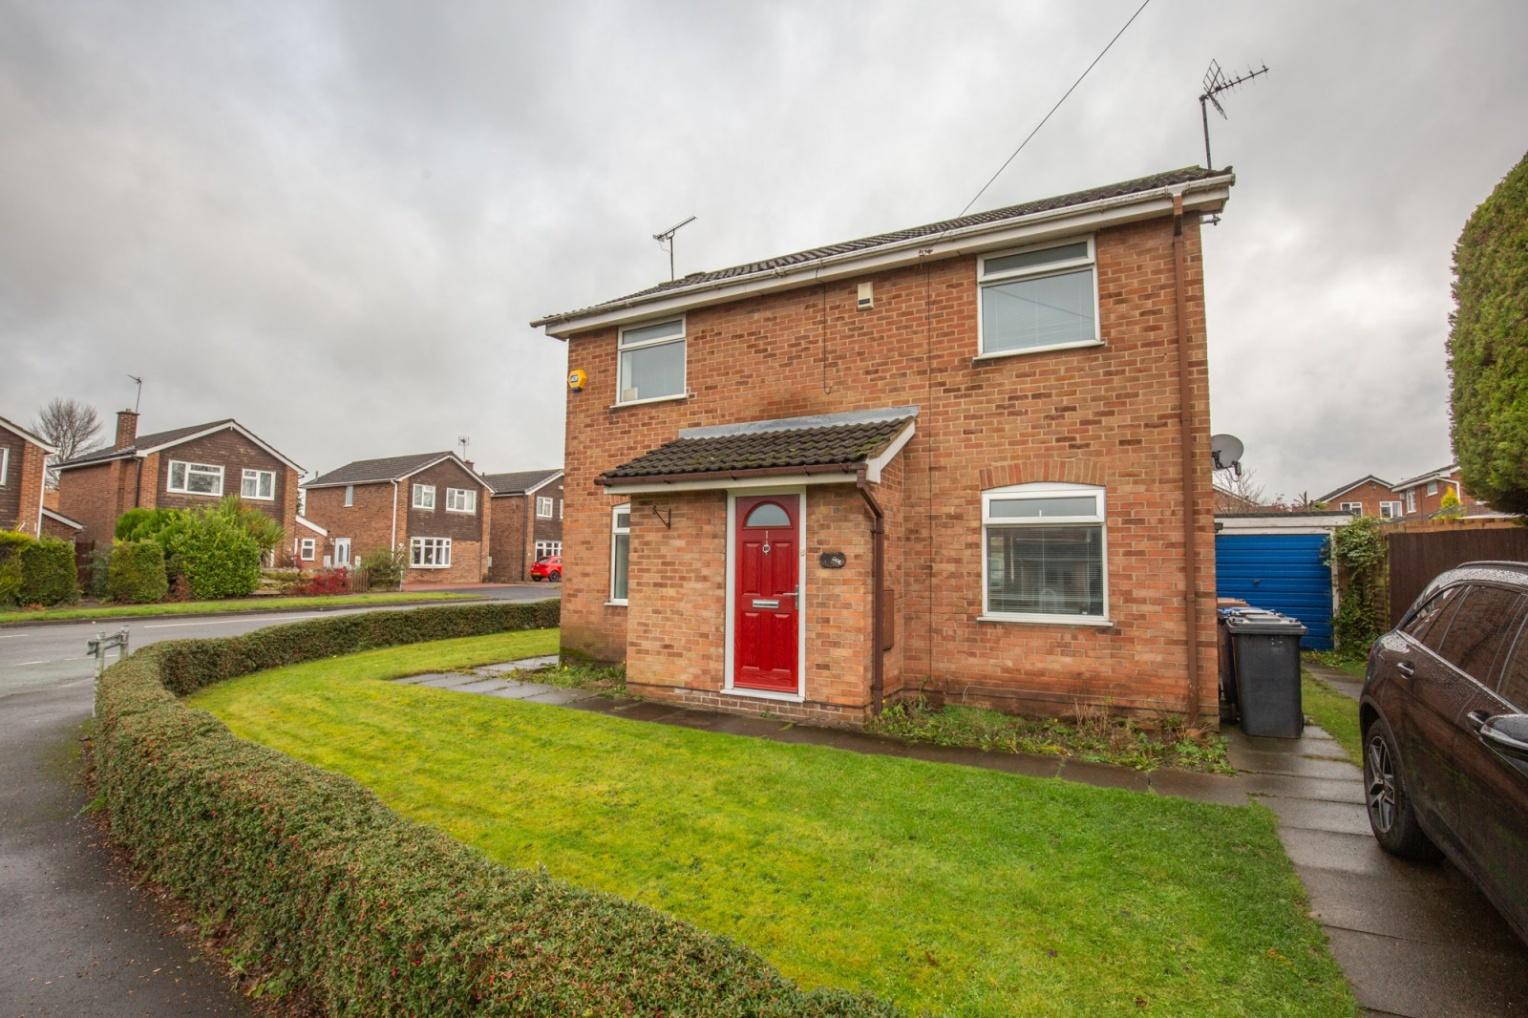 Corbel Close, Oakwood, Derby, Derbyshire, DE21, Derby, DE21